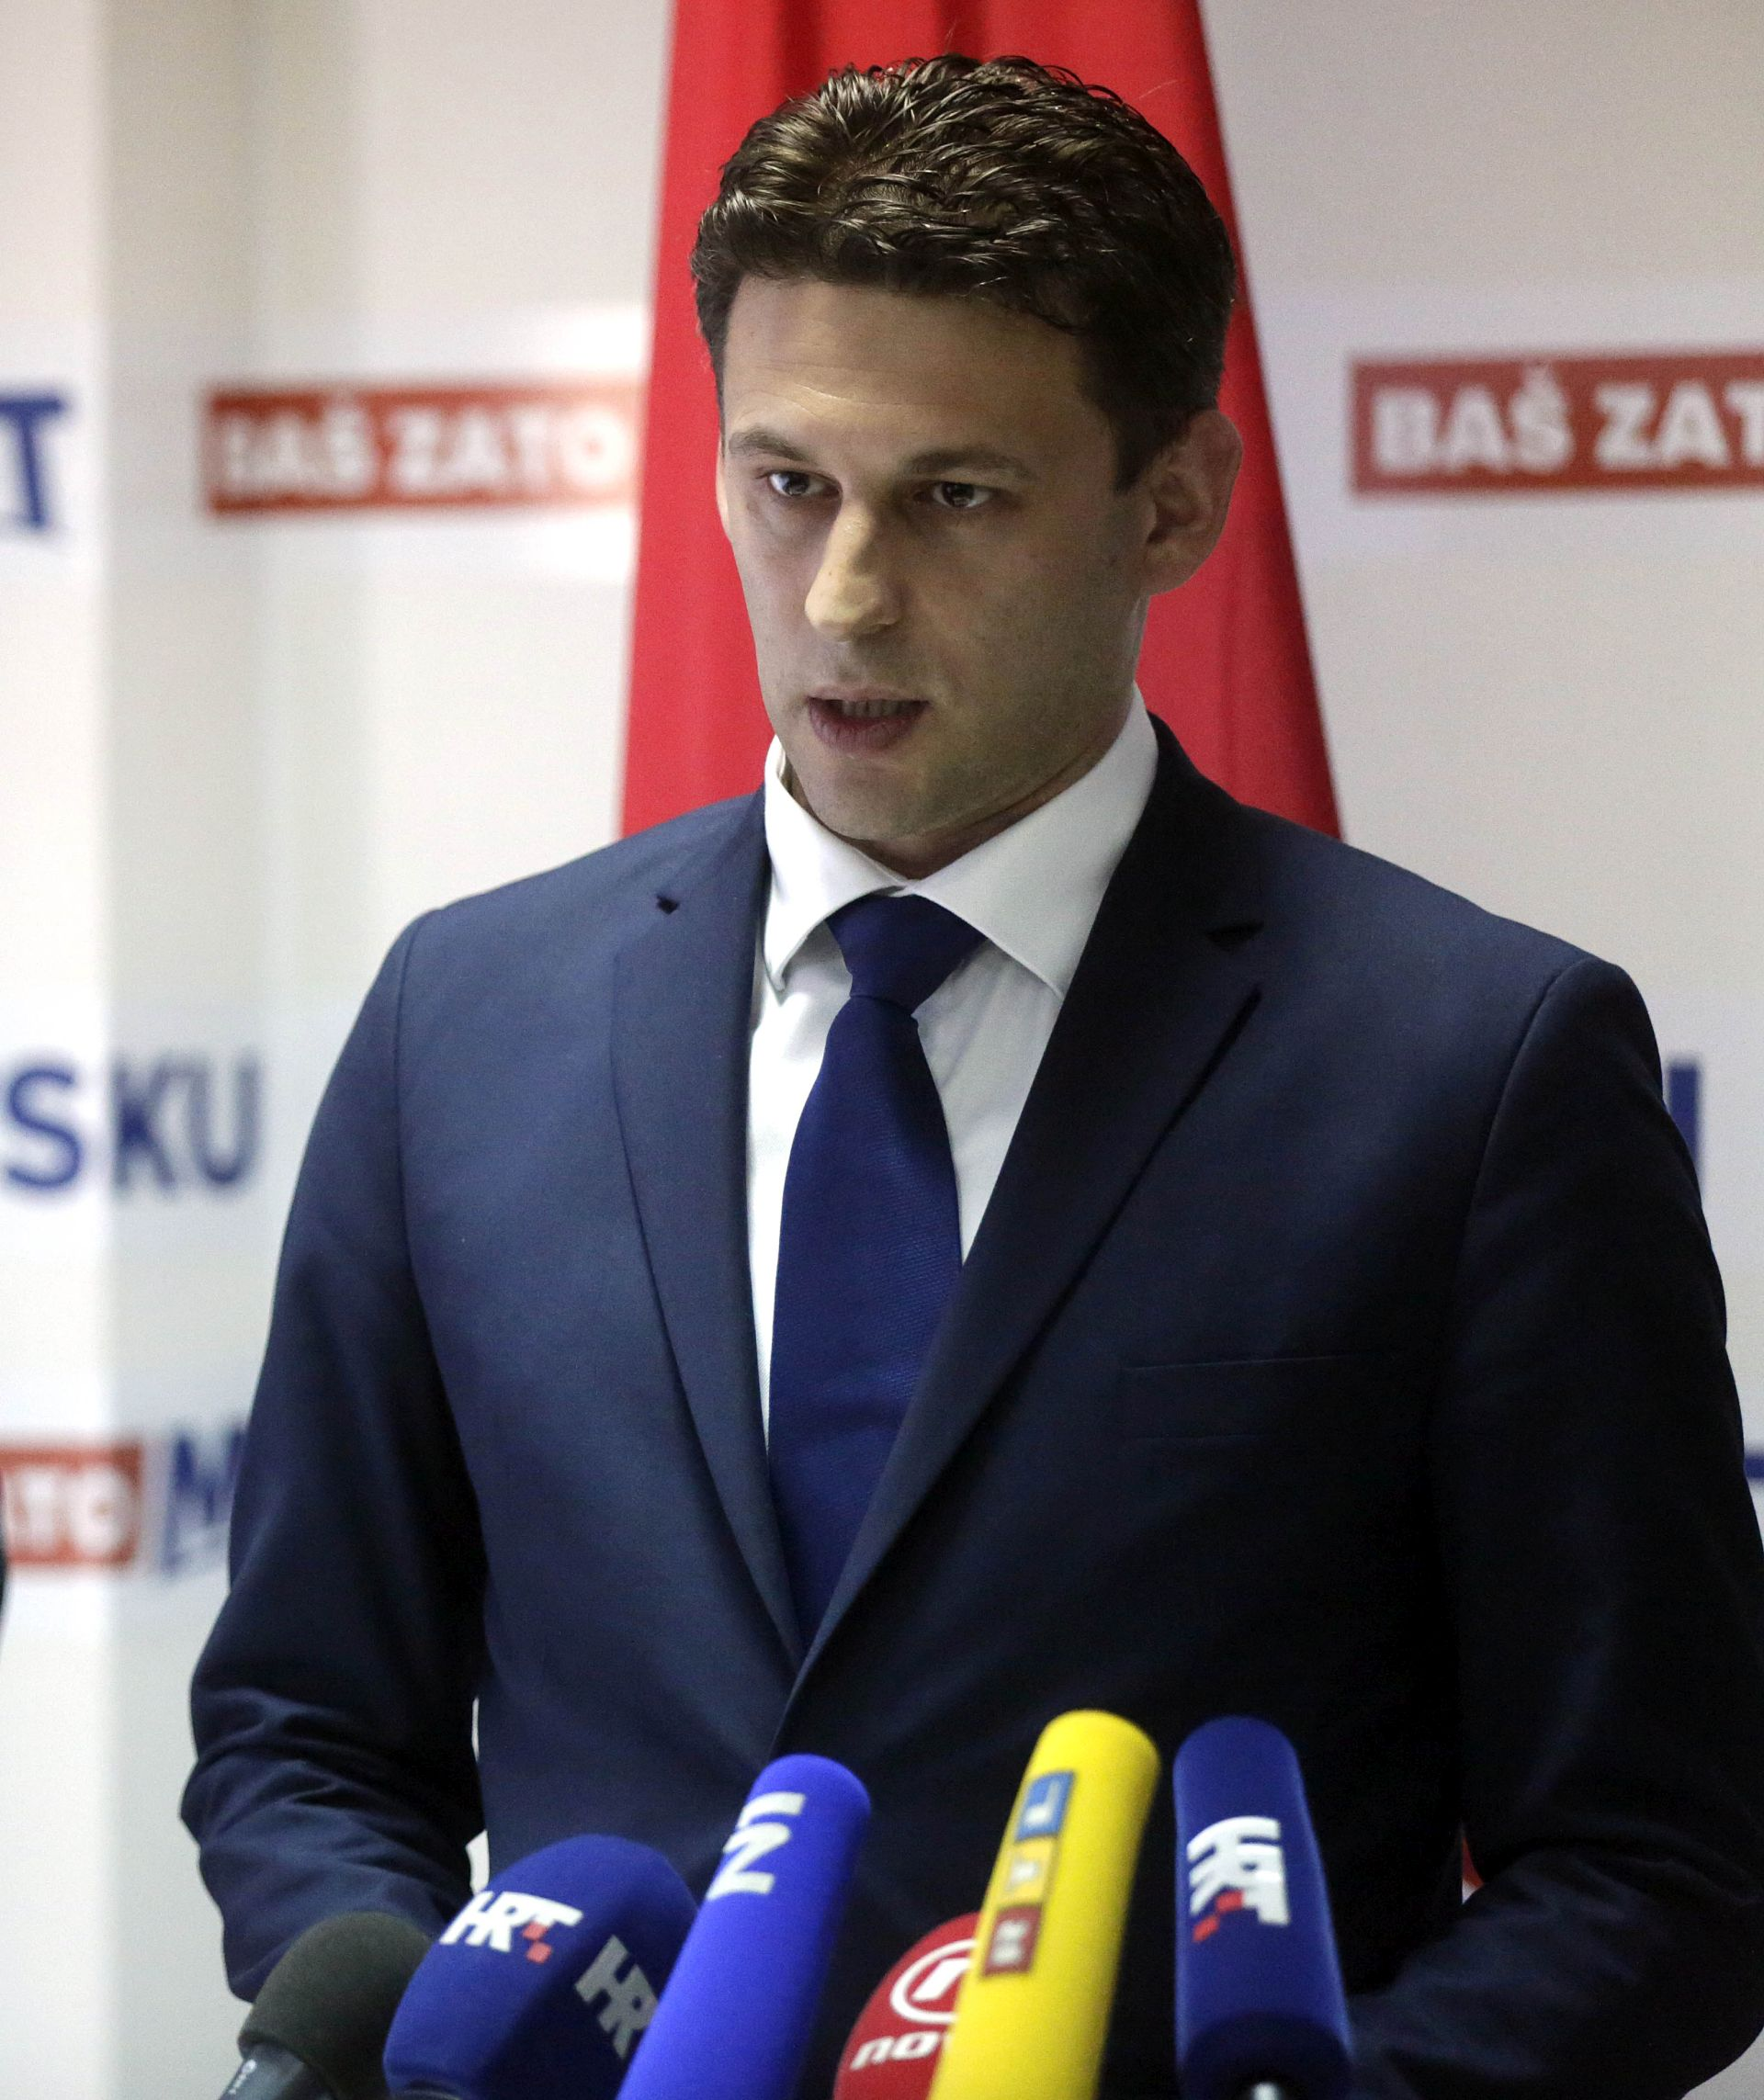 Petrov poziva HDZ da se očituje vezano za slučaj 'konzultantica'